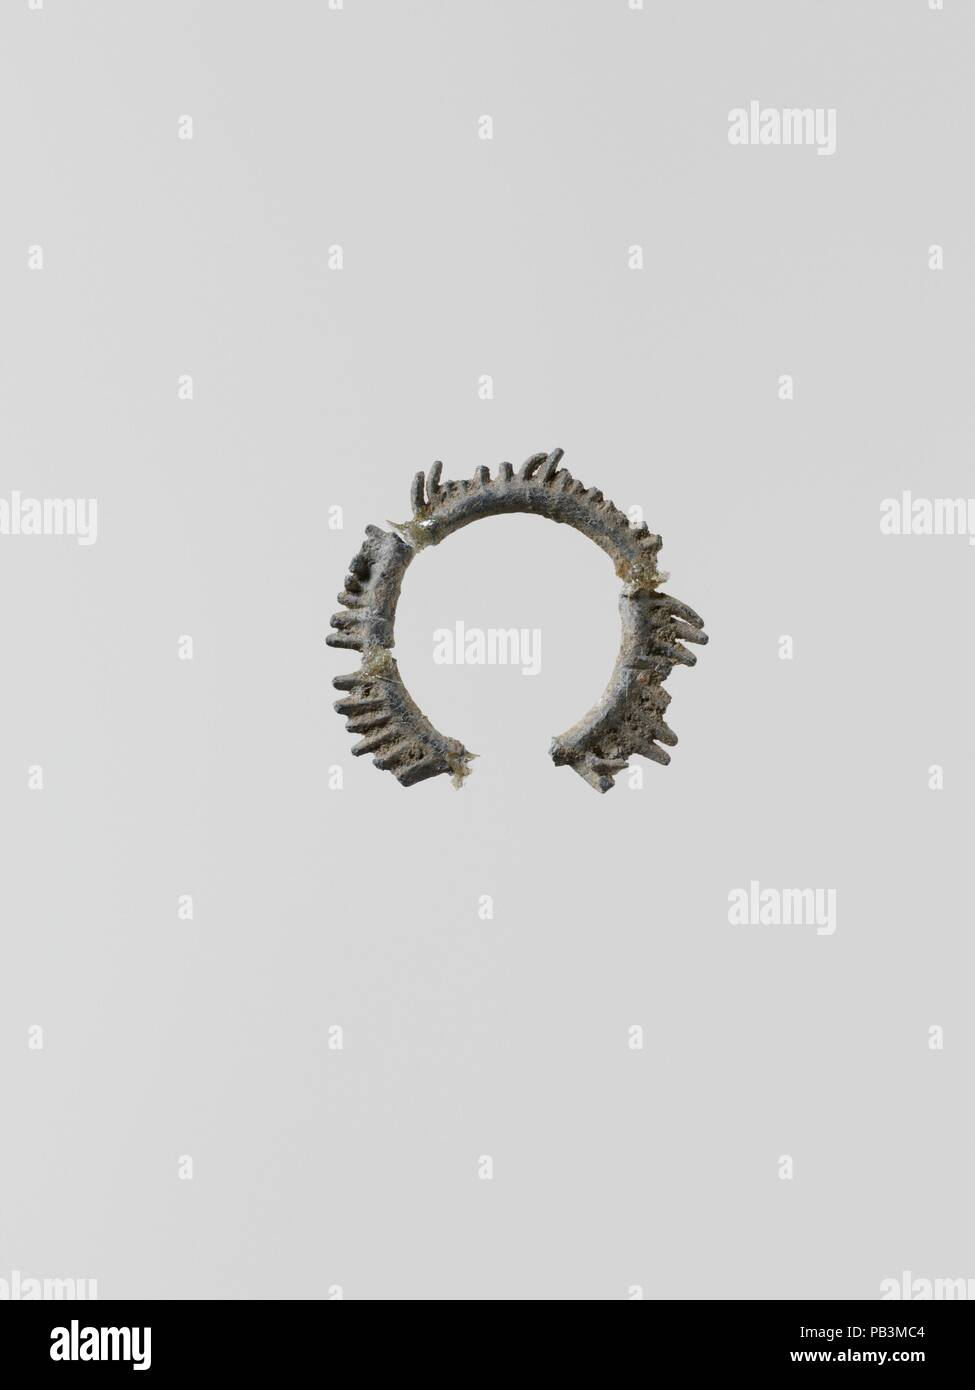 Wreaths, 11. Culture: Greek, Laconian. Dimensions: 4 fragments. Museum: Metropolitan Museum of Art, New York, USA. Stock Photo